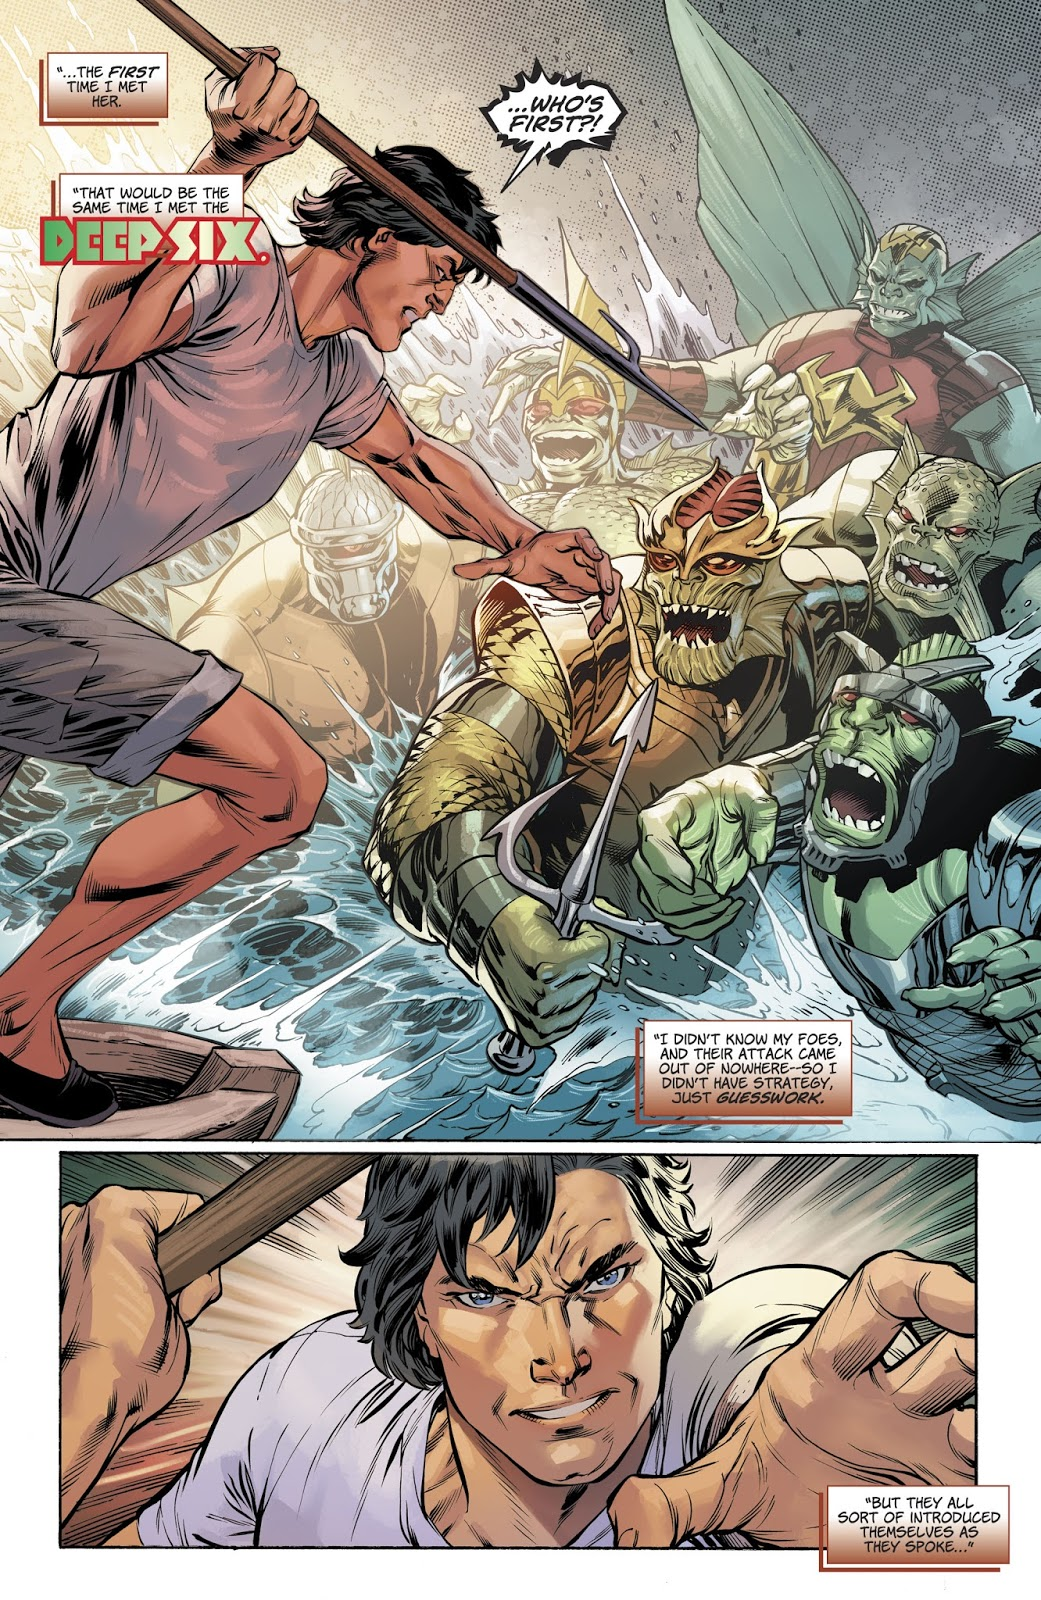 Jason VS The Deep Six